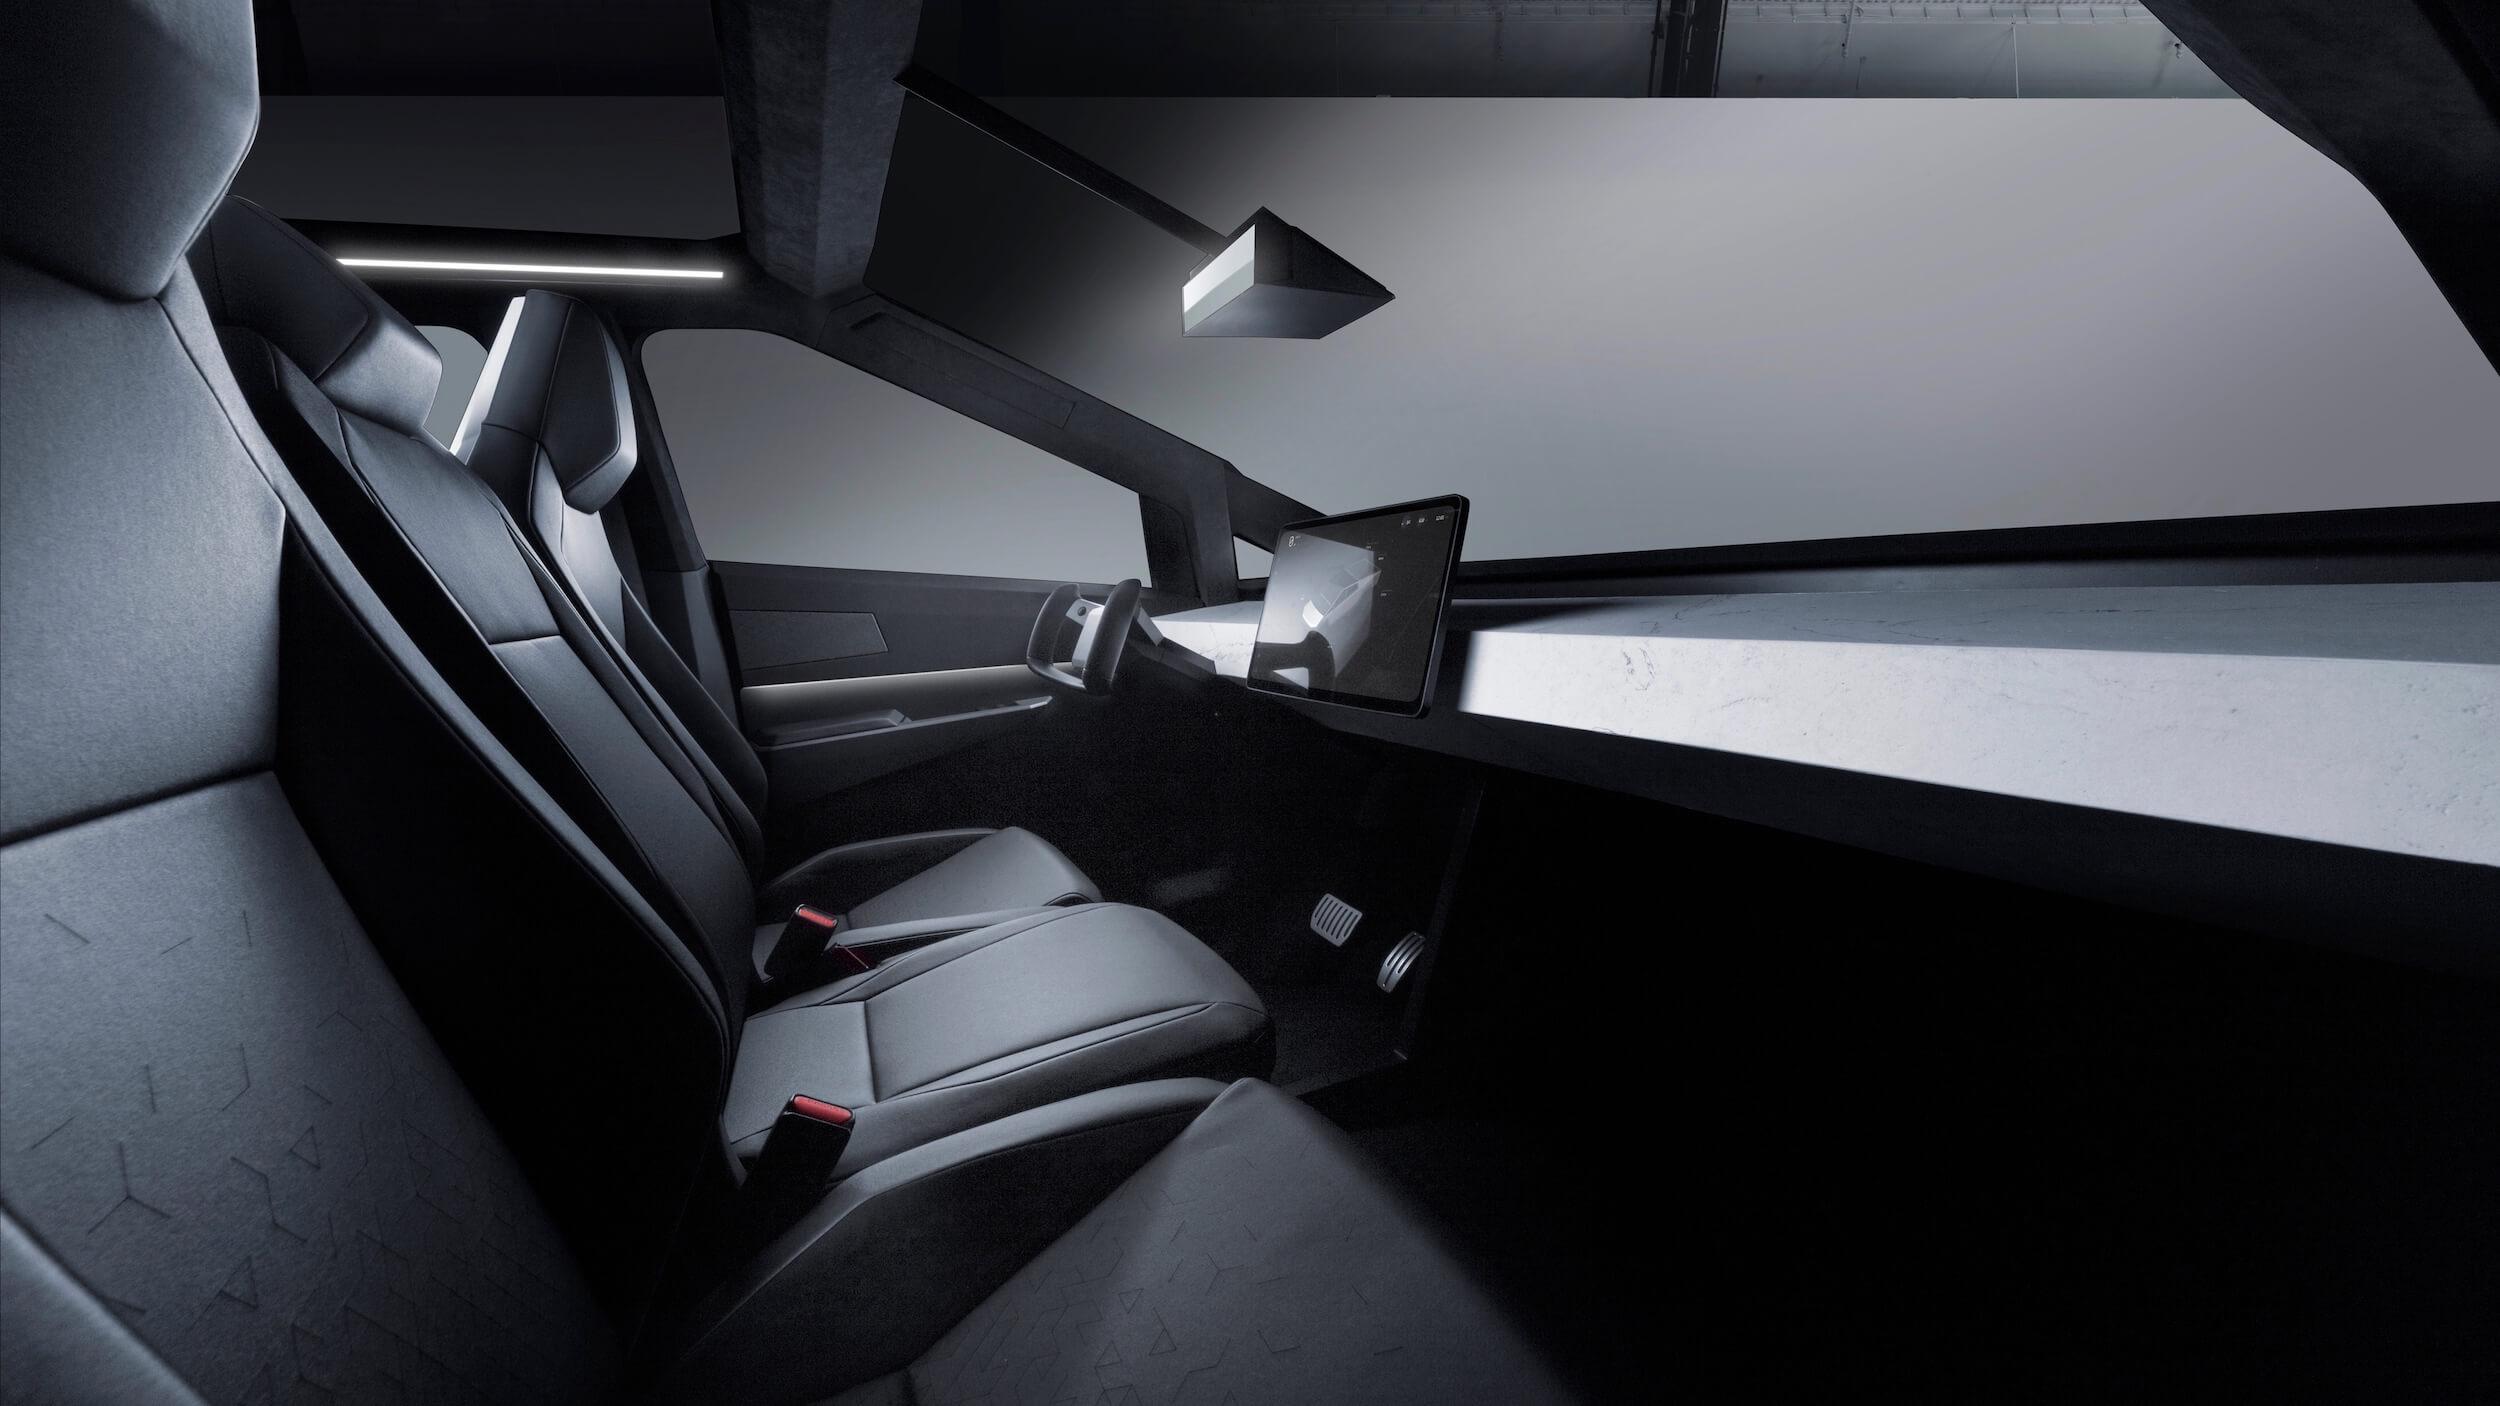 Tesla Cybertruck dashboard interieur